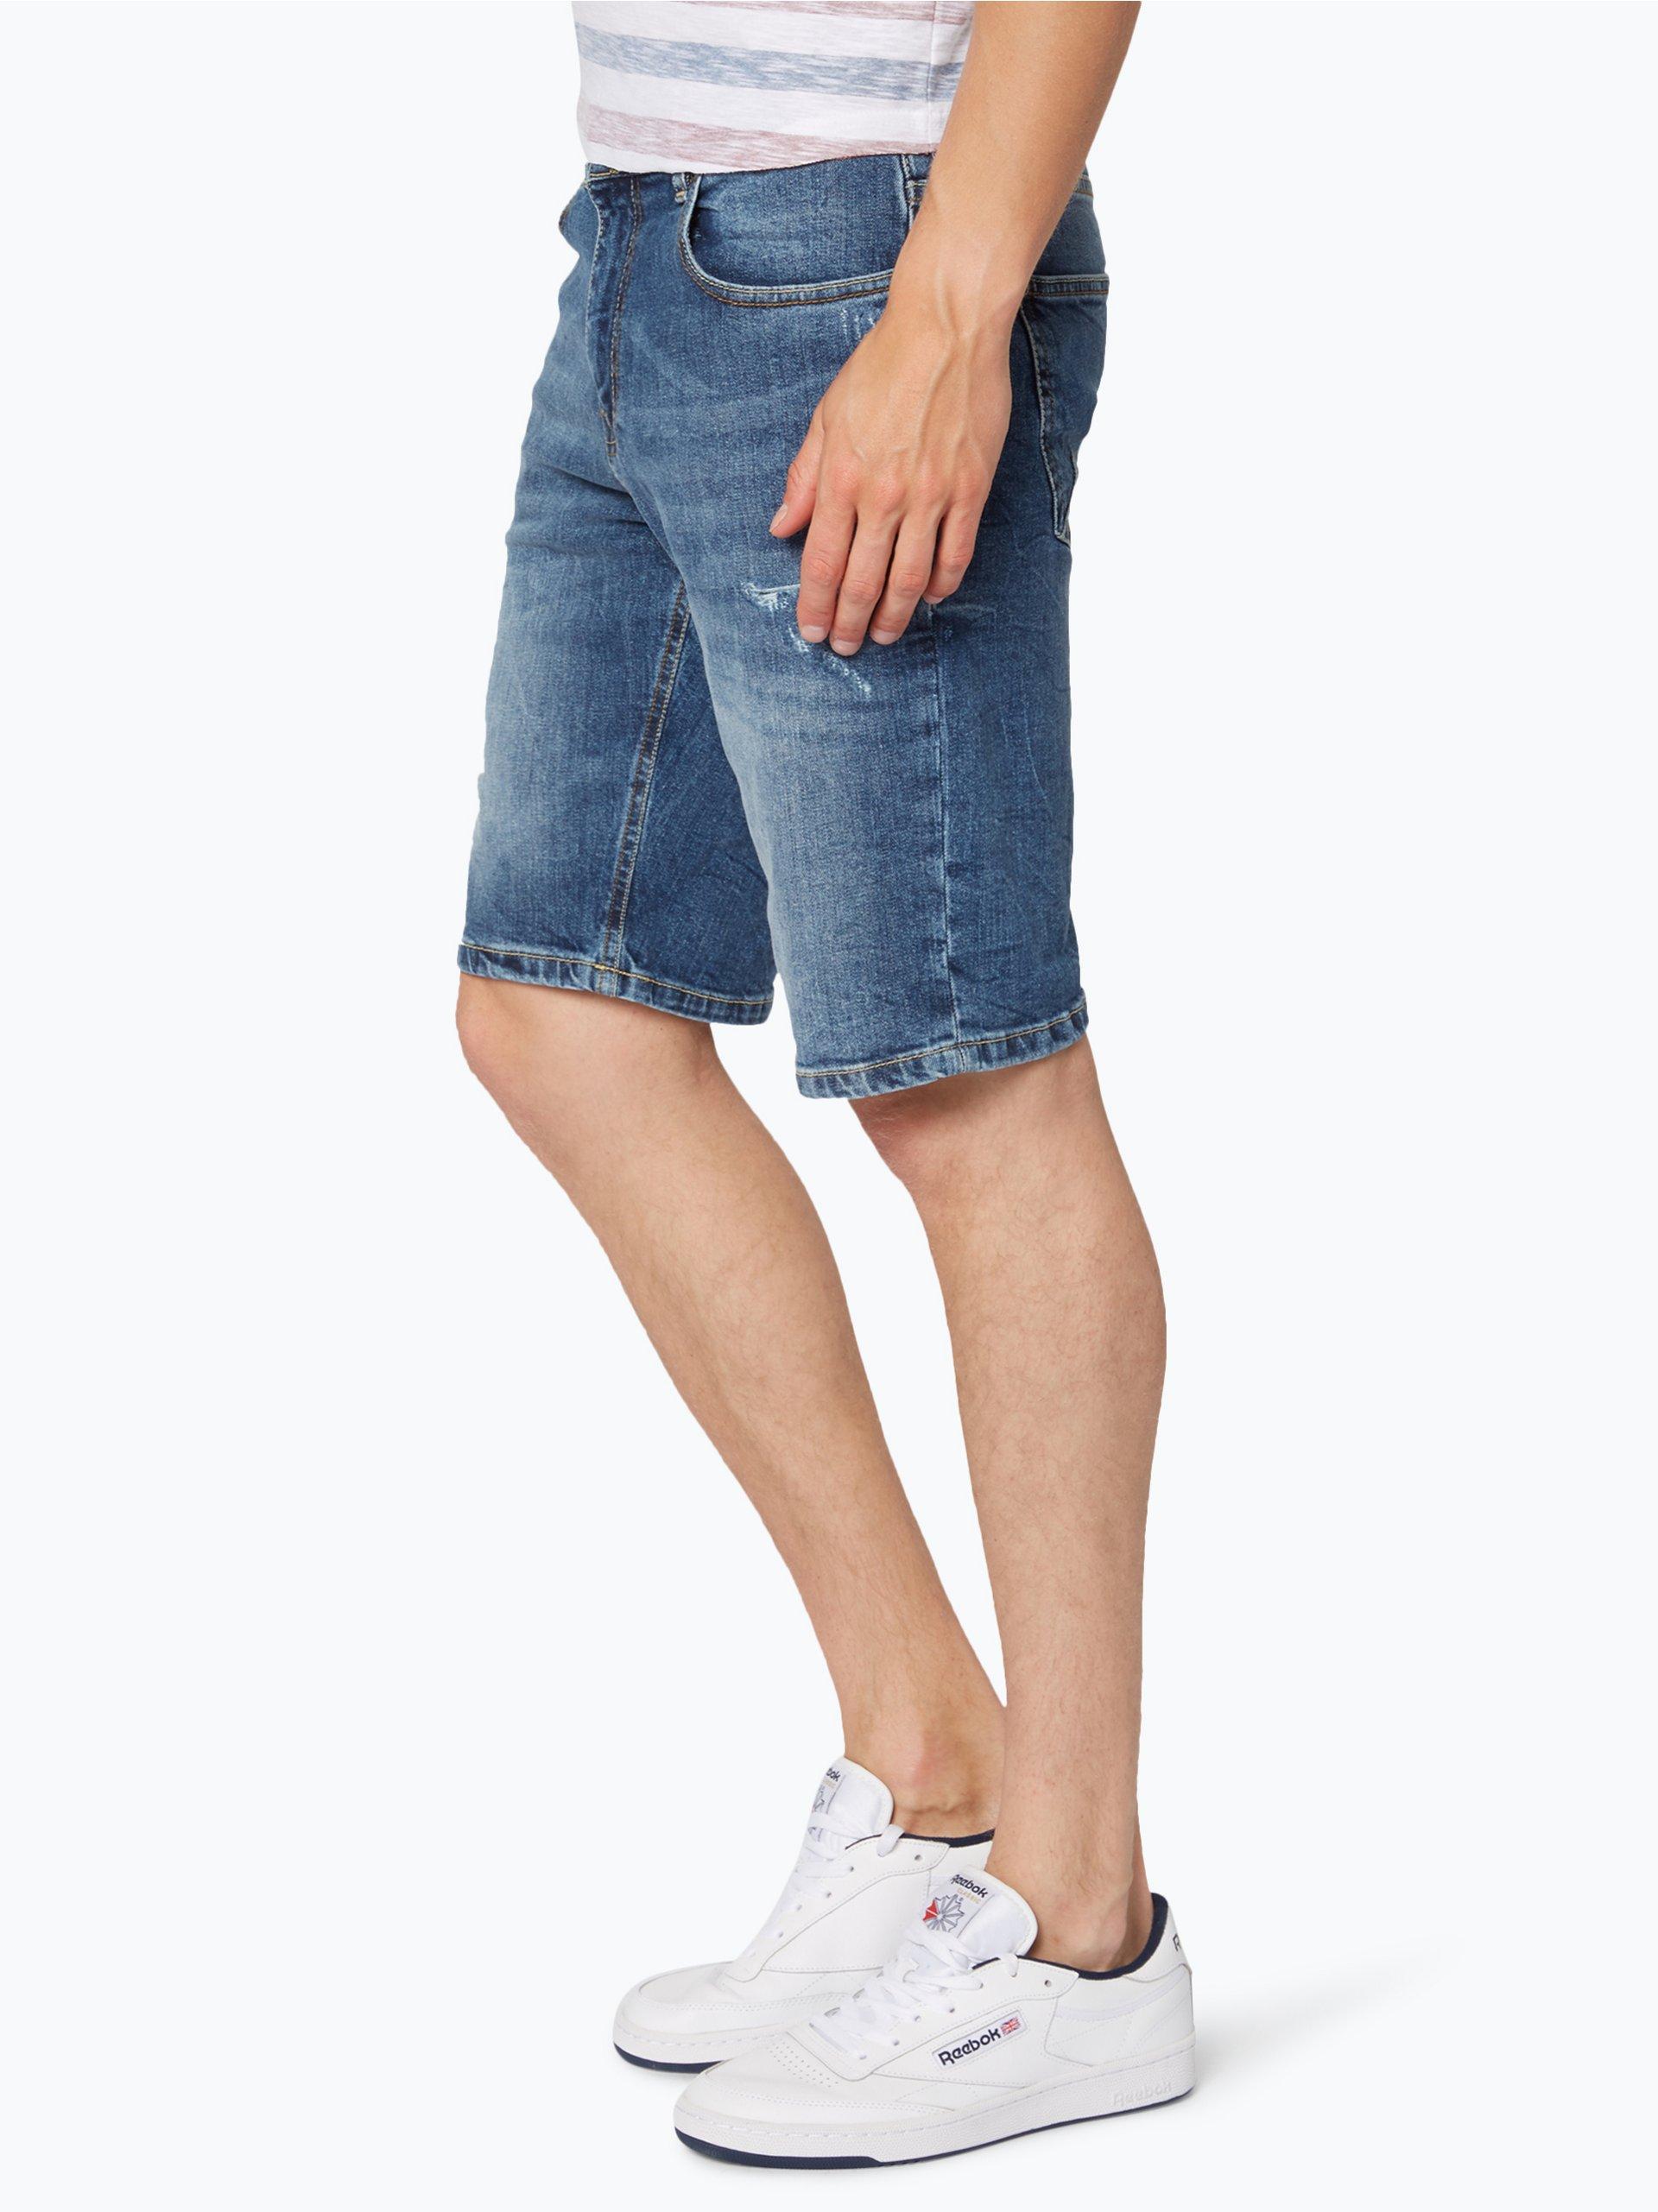 review herren jeans bermuda blau uni online kaufen peek und cloppenburg de. Black Bedroom Furniture Sets. Home Design Ideas